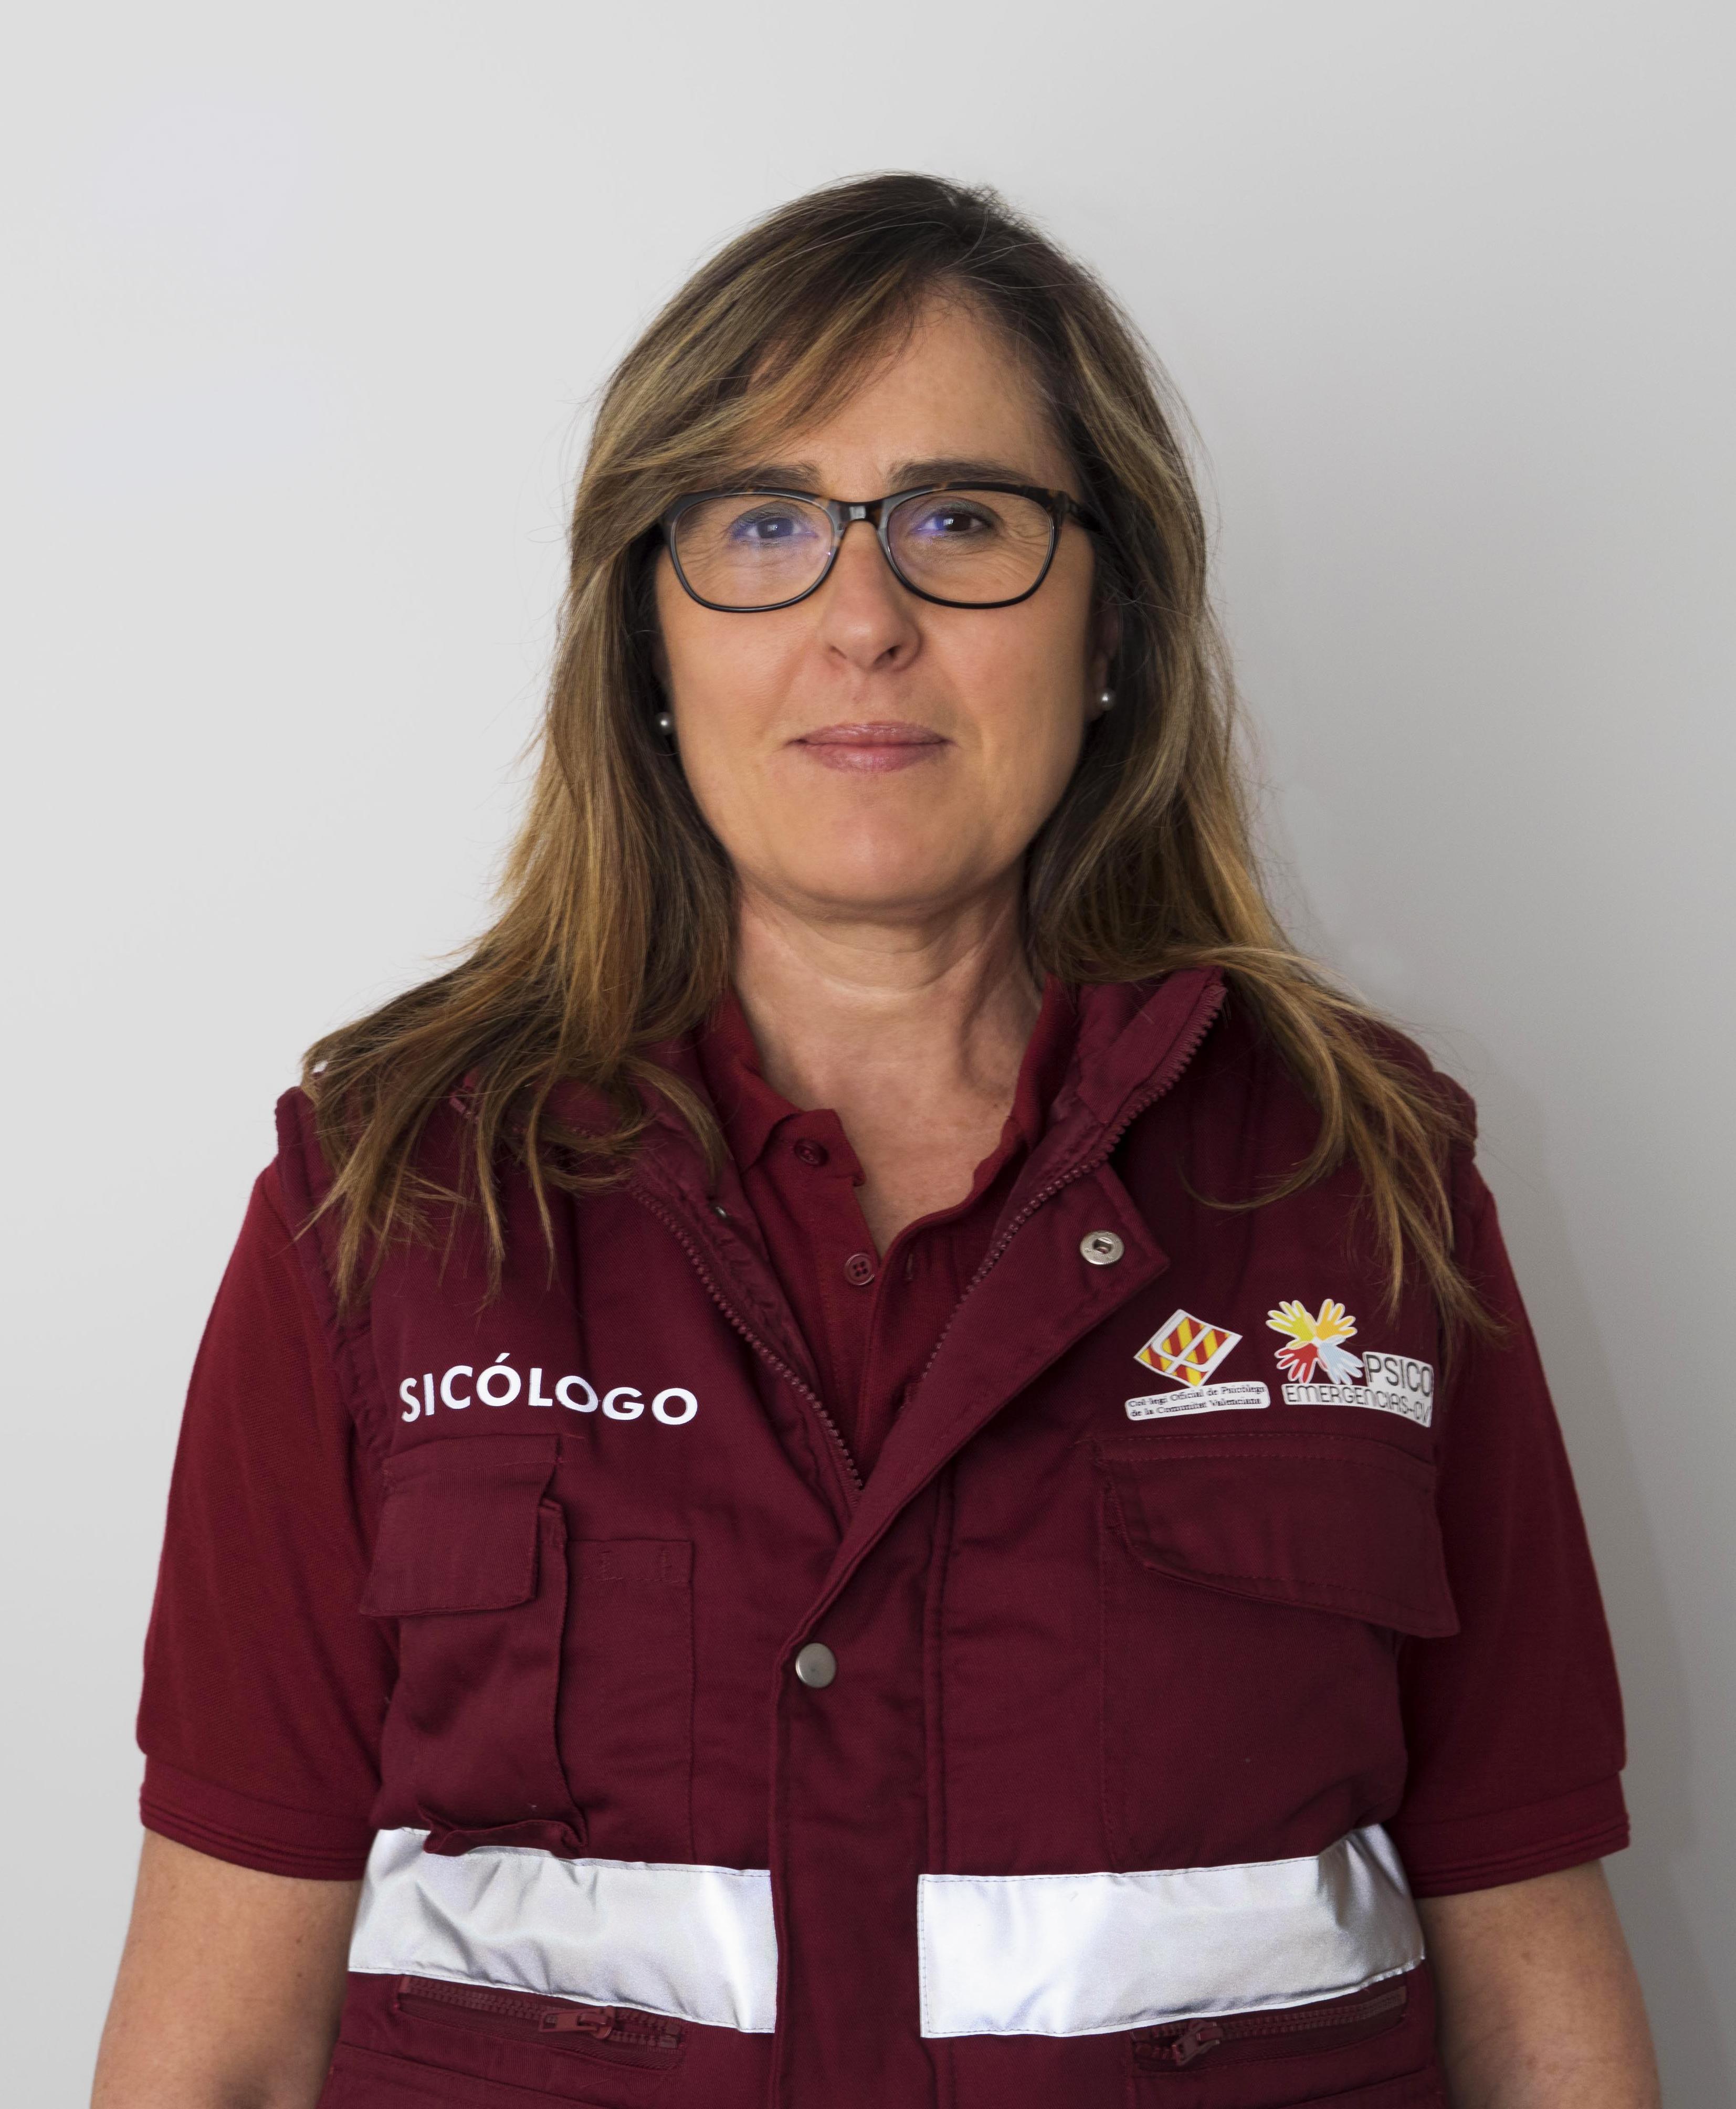 Laura Torres Moratalla